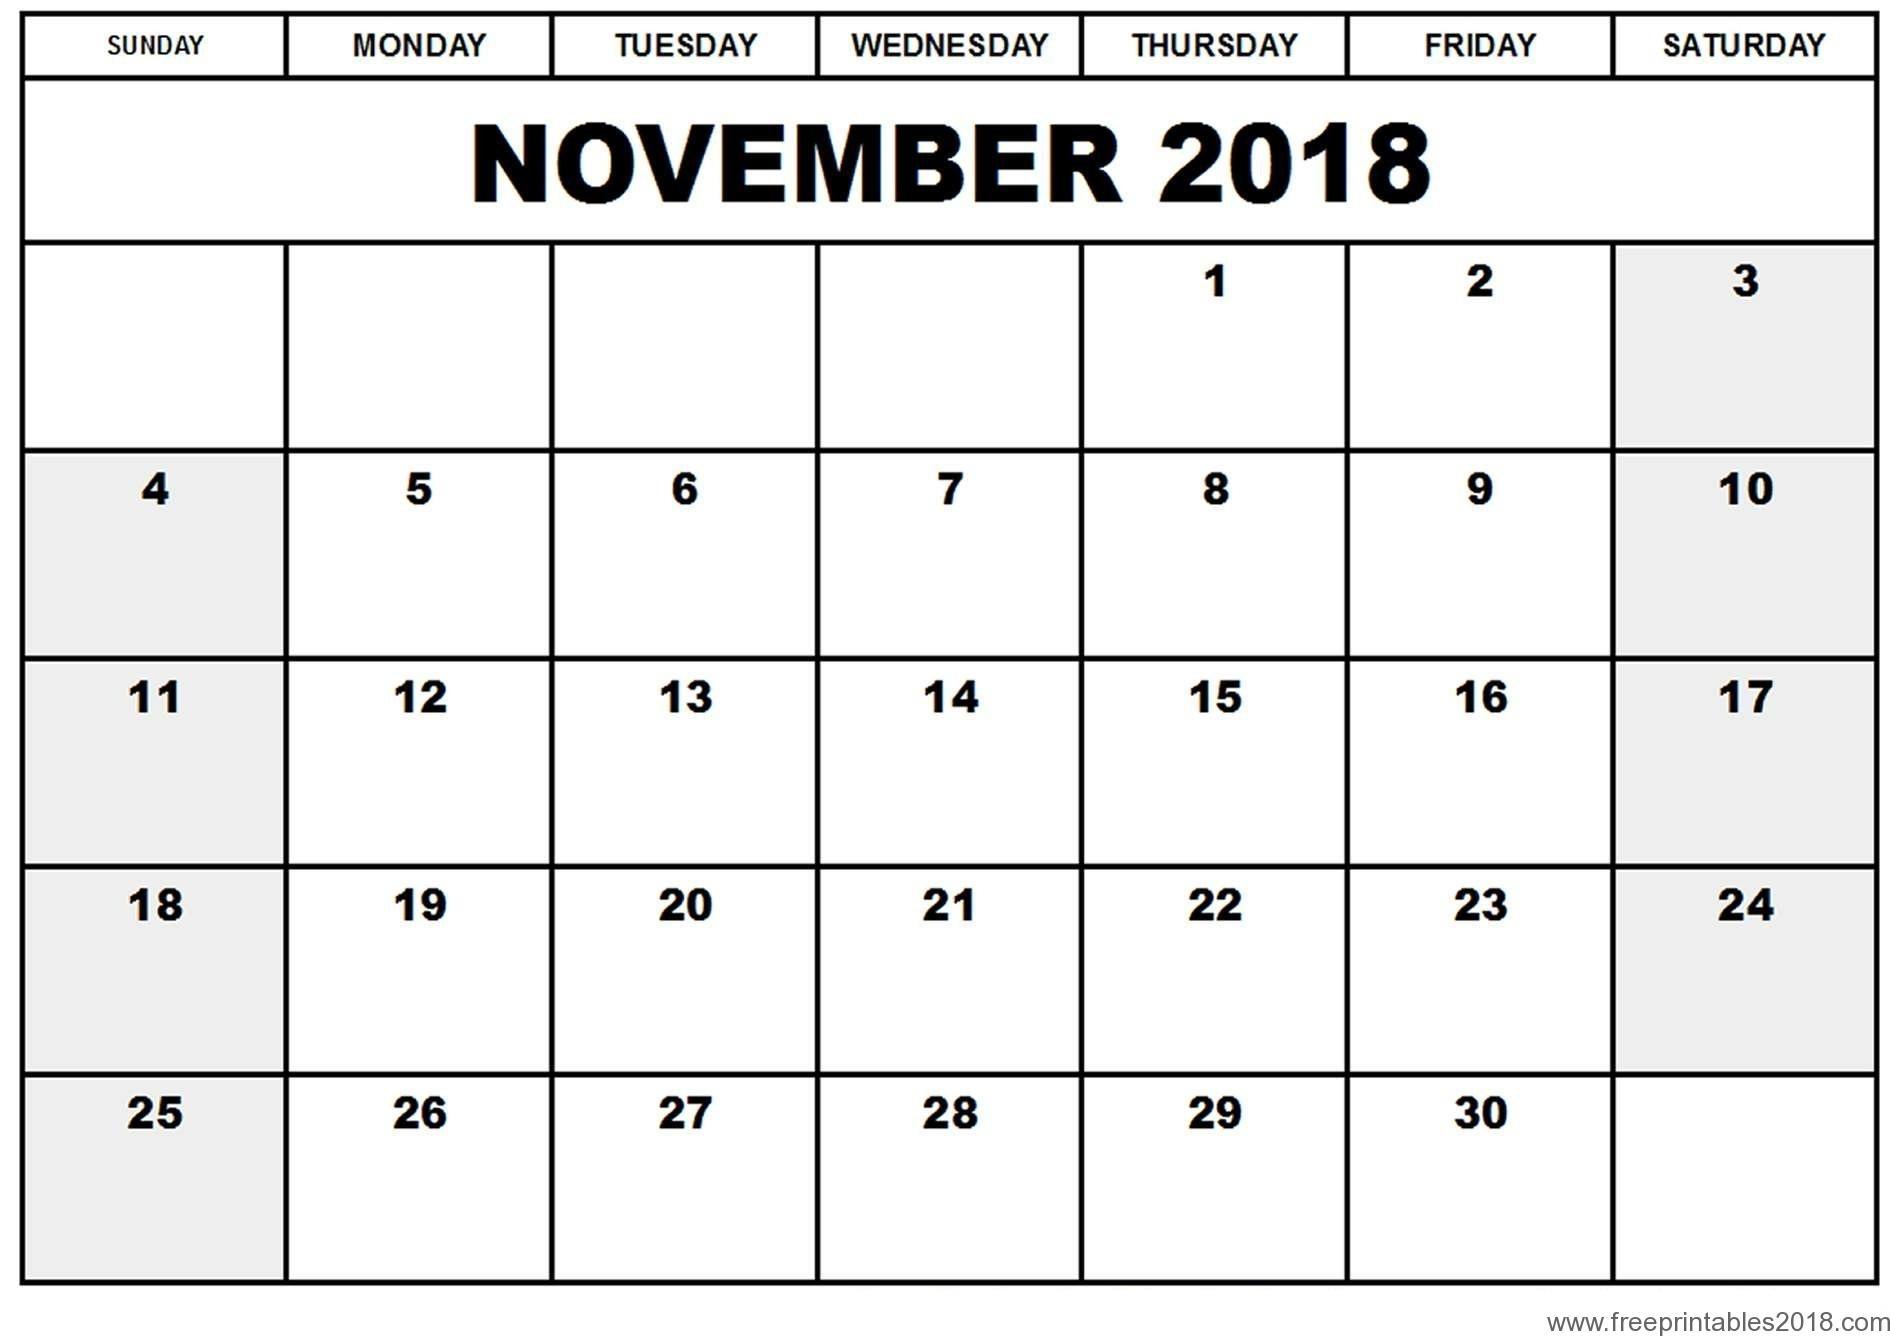 Free Printable Calendar November 2018 | Free Printables 2019